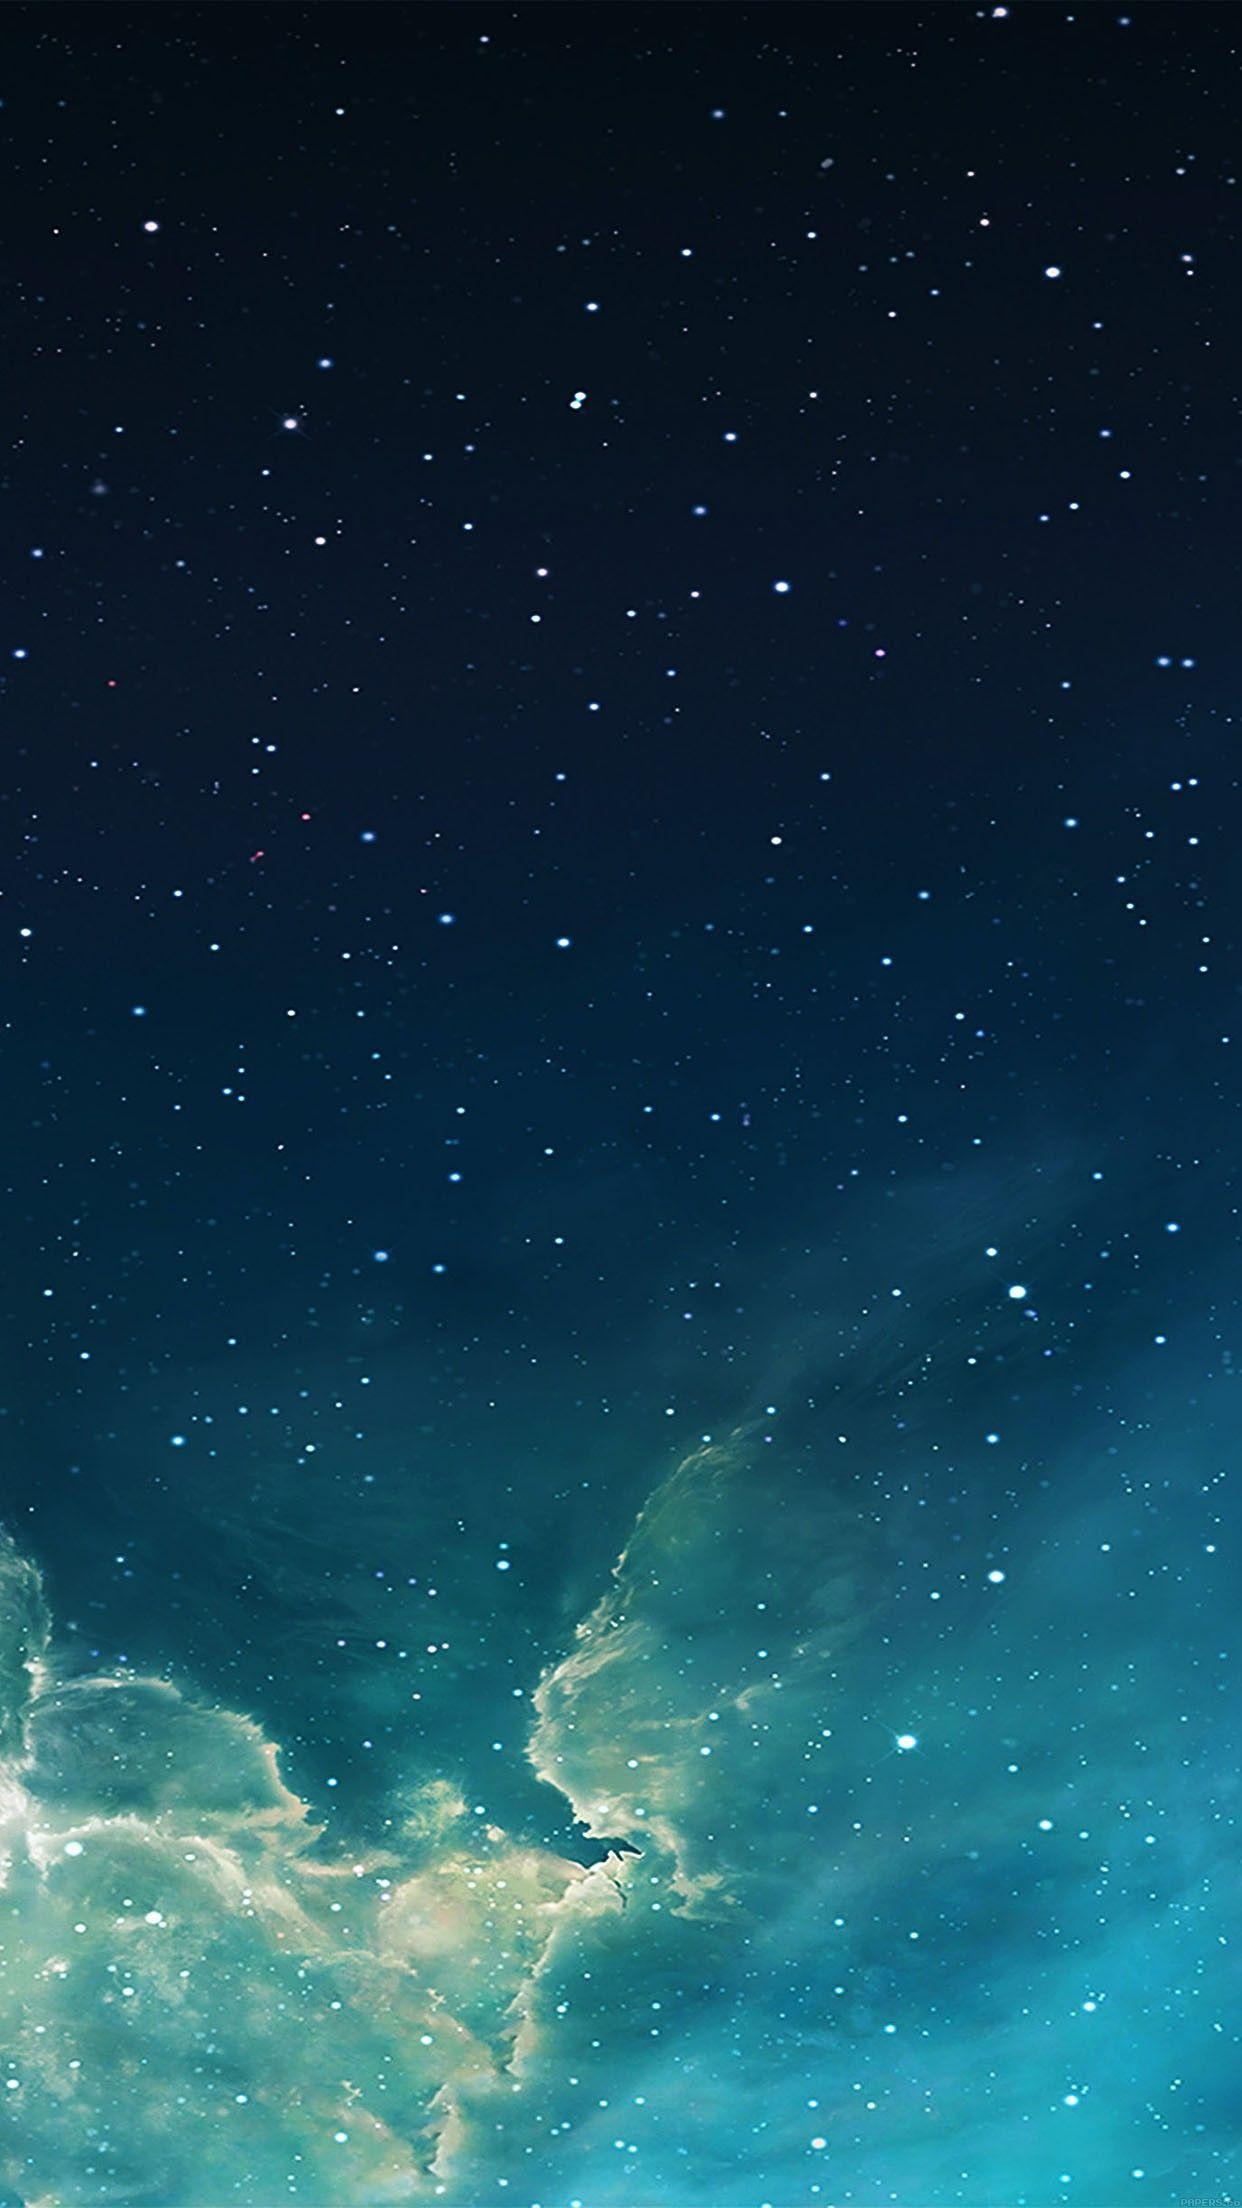 sky wallpaper iphone – wallpaper designs for iphone